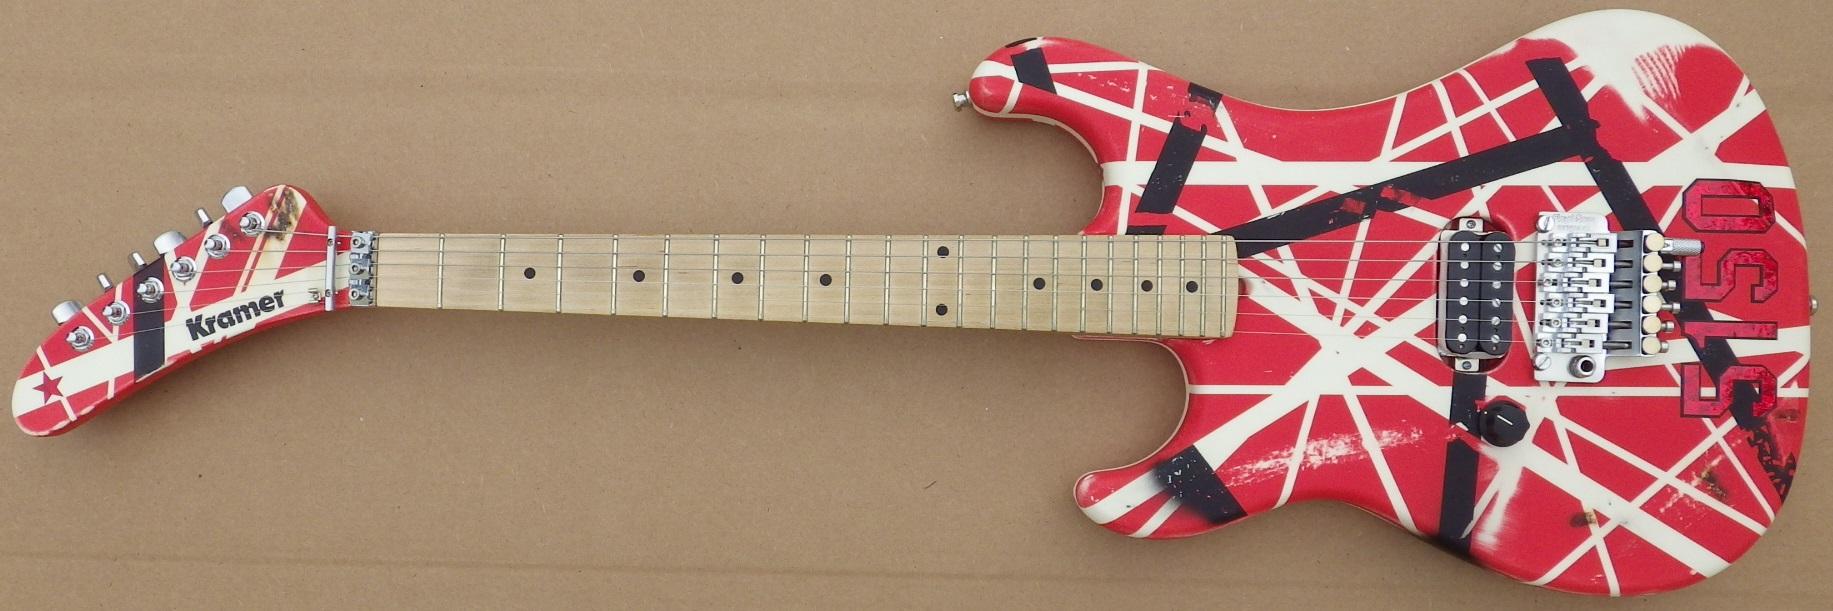 Mean Street paint job over GMW guitar 5150R Juan D pic 1.jpg